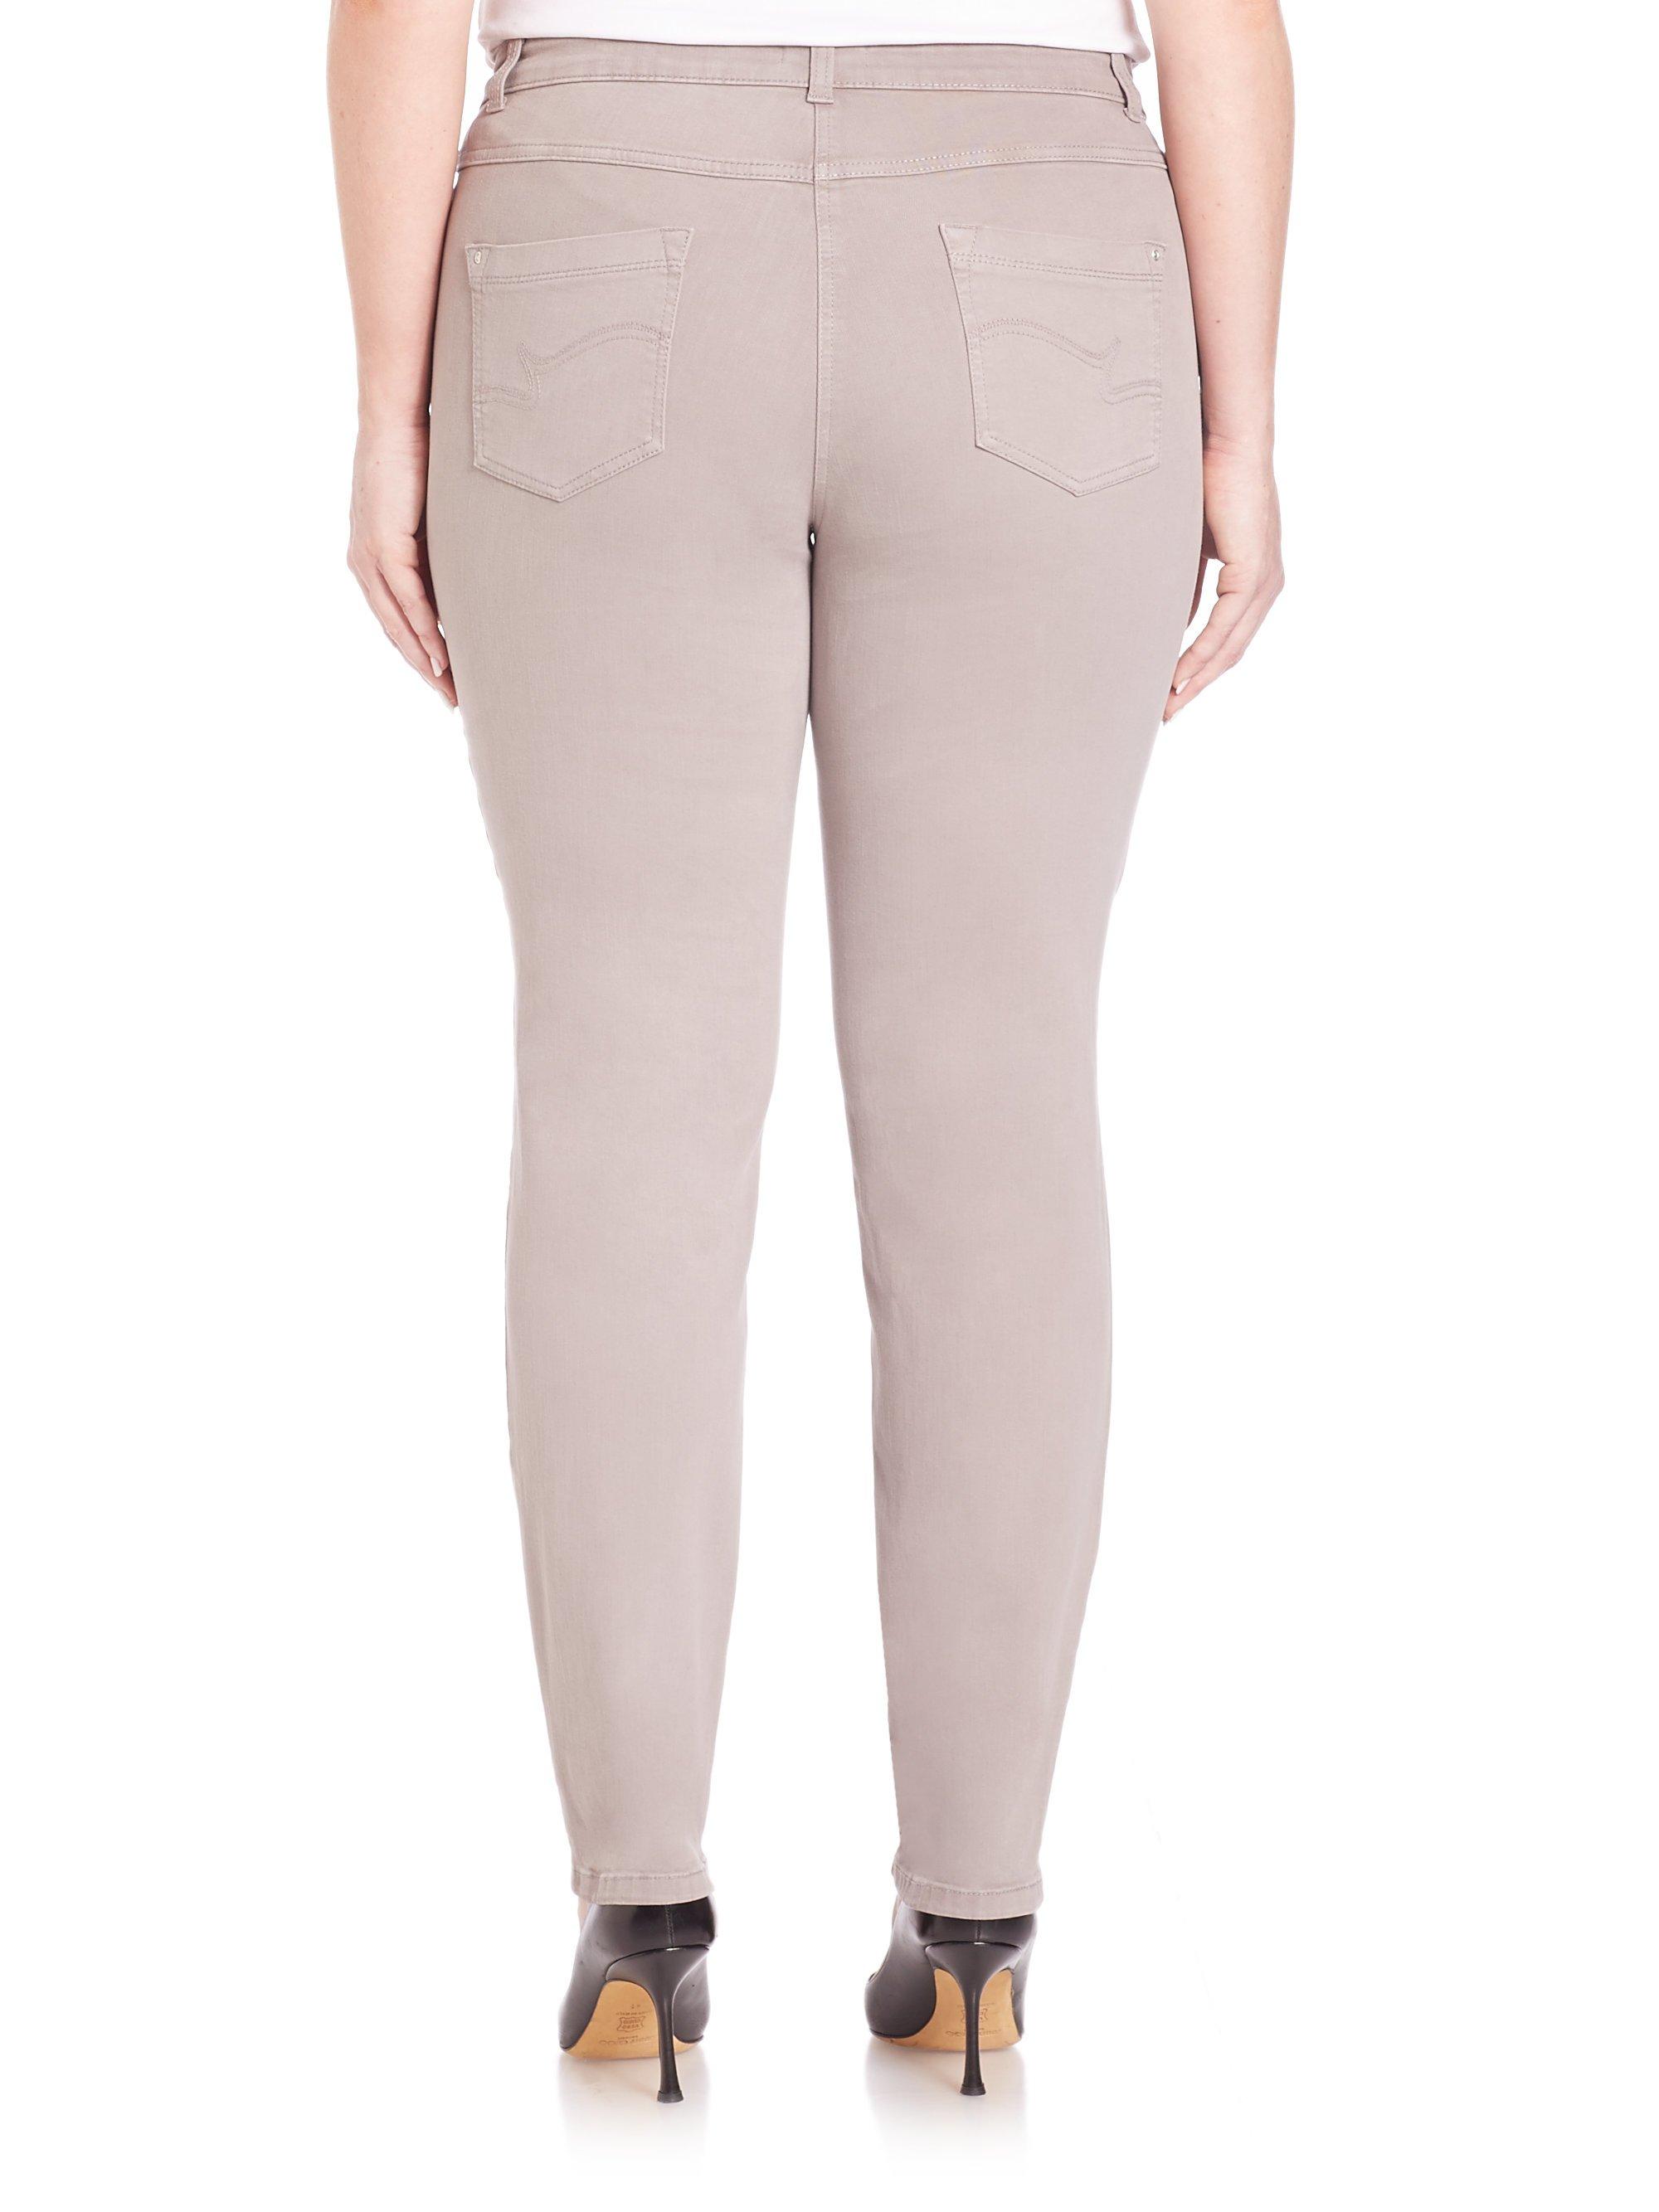 Lyst basler julienne bi stretch twill jeans in gray gallery nvjuhfo Images